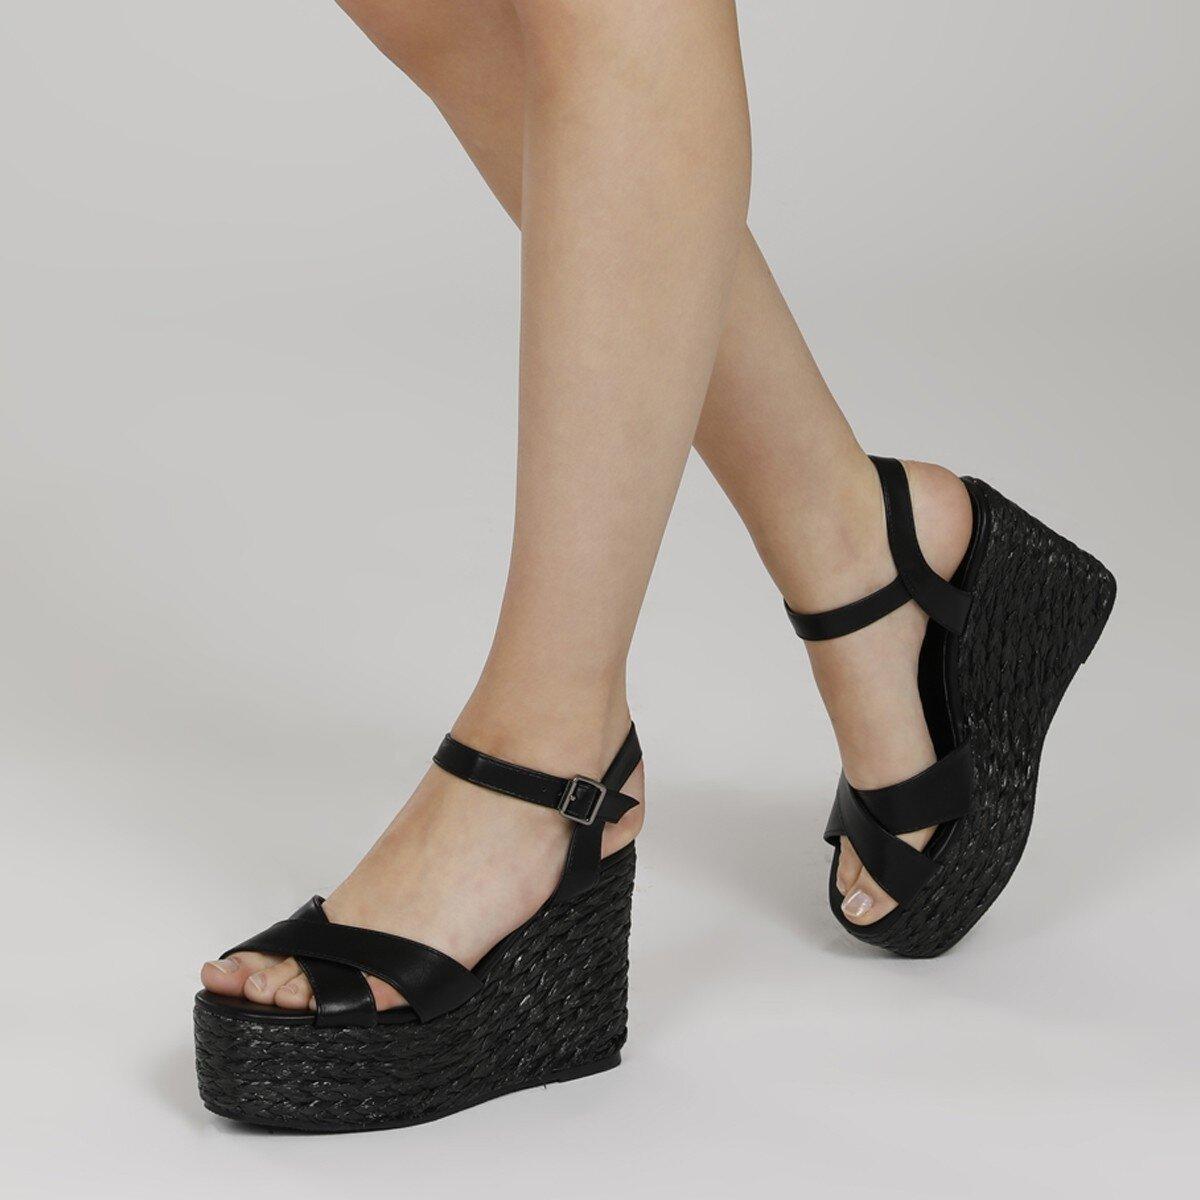 WIEMA 1FX Siyah Kadın Dolgu Topuk Sandalet